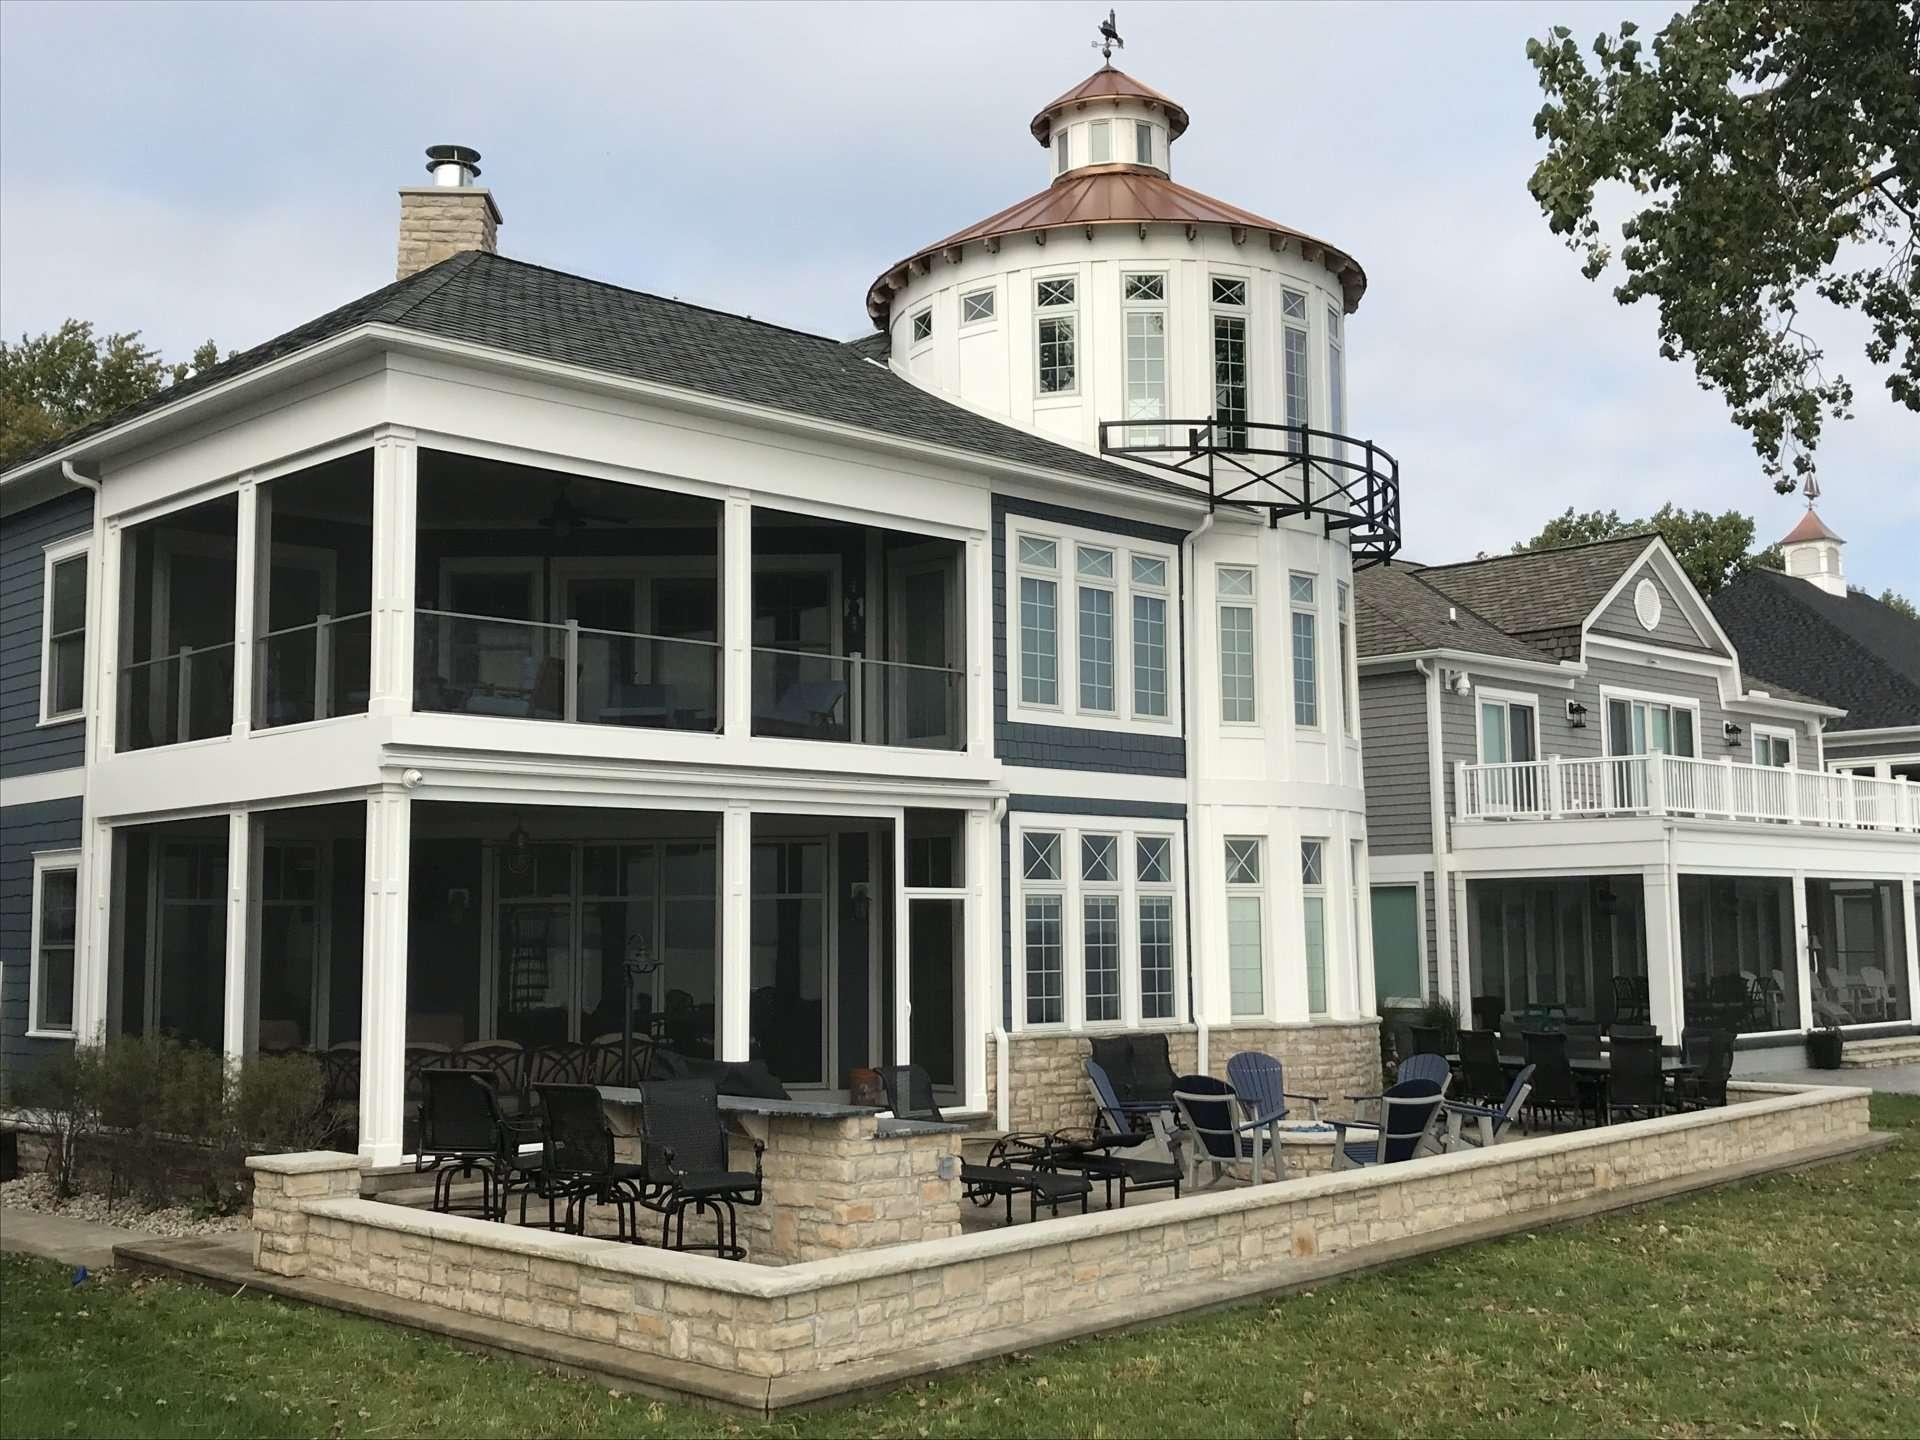 grande-maison-featured-image